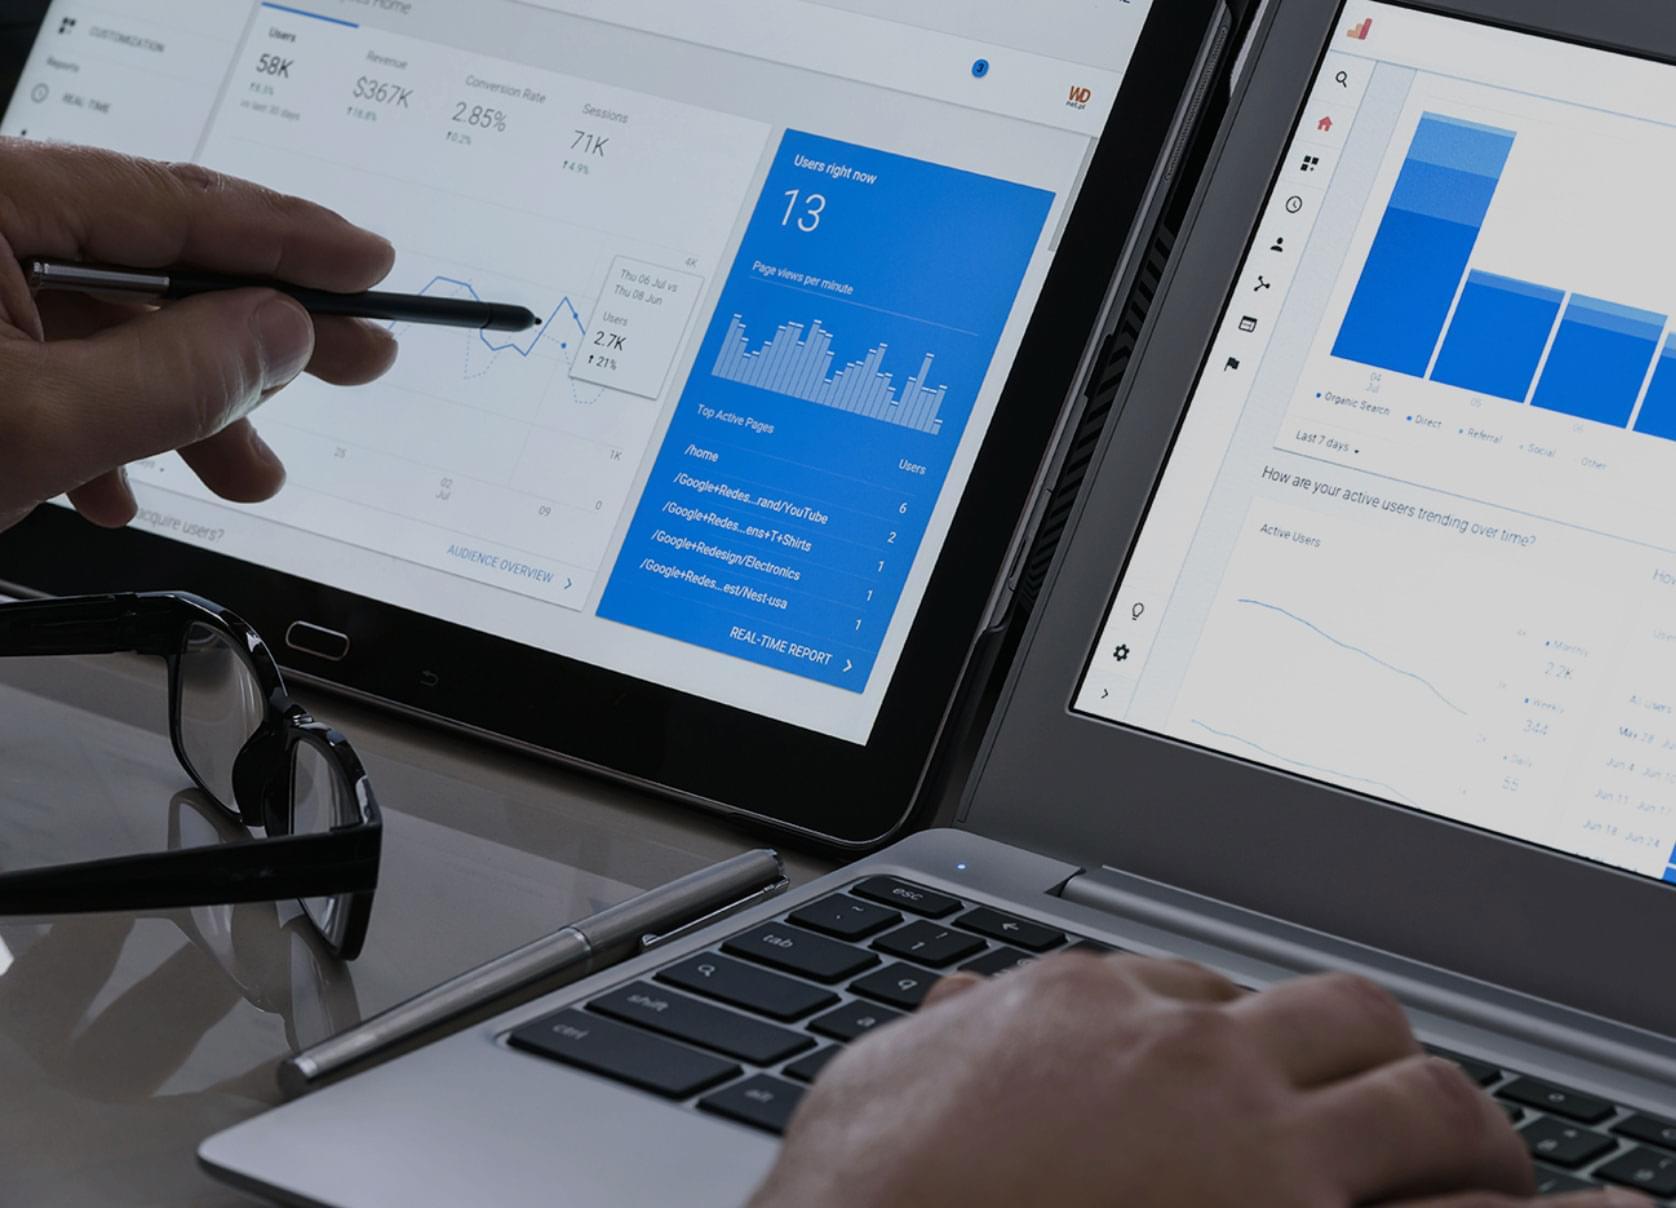 view of 2 laptop screens showing analytics data